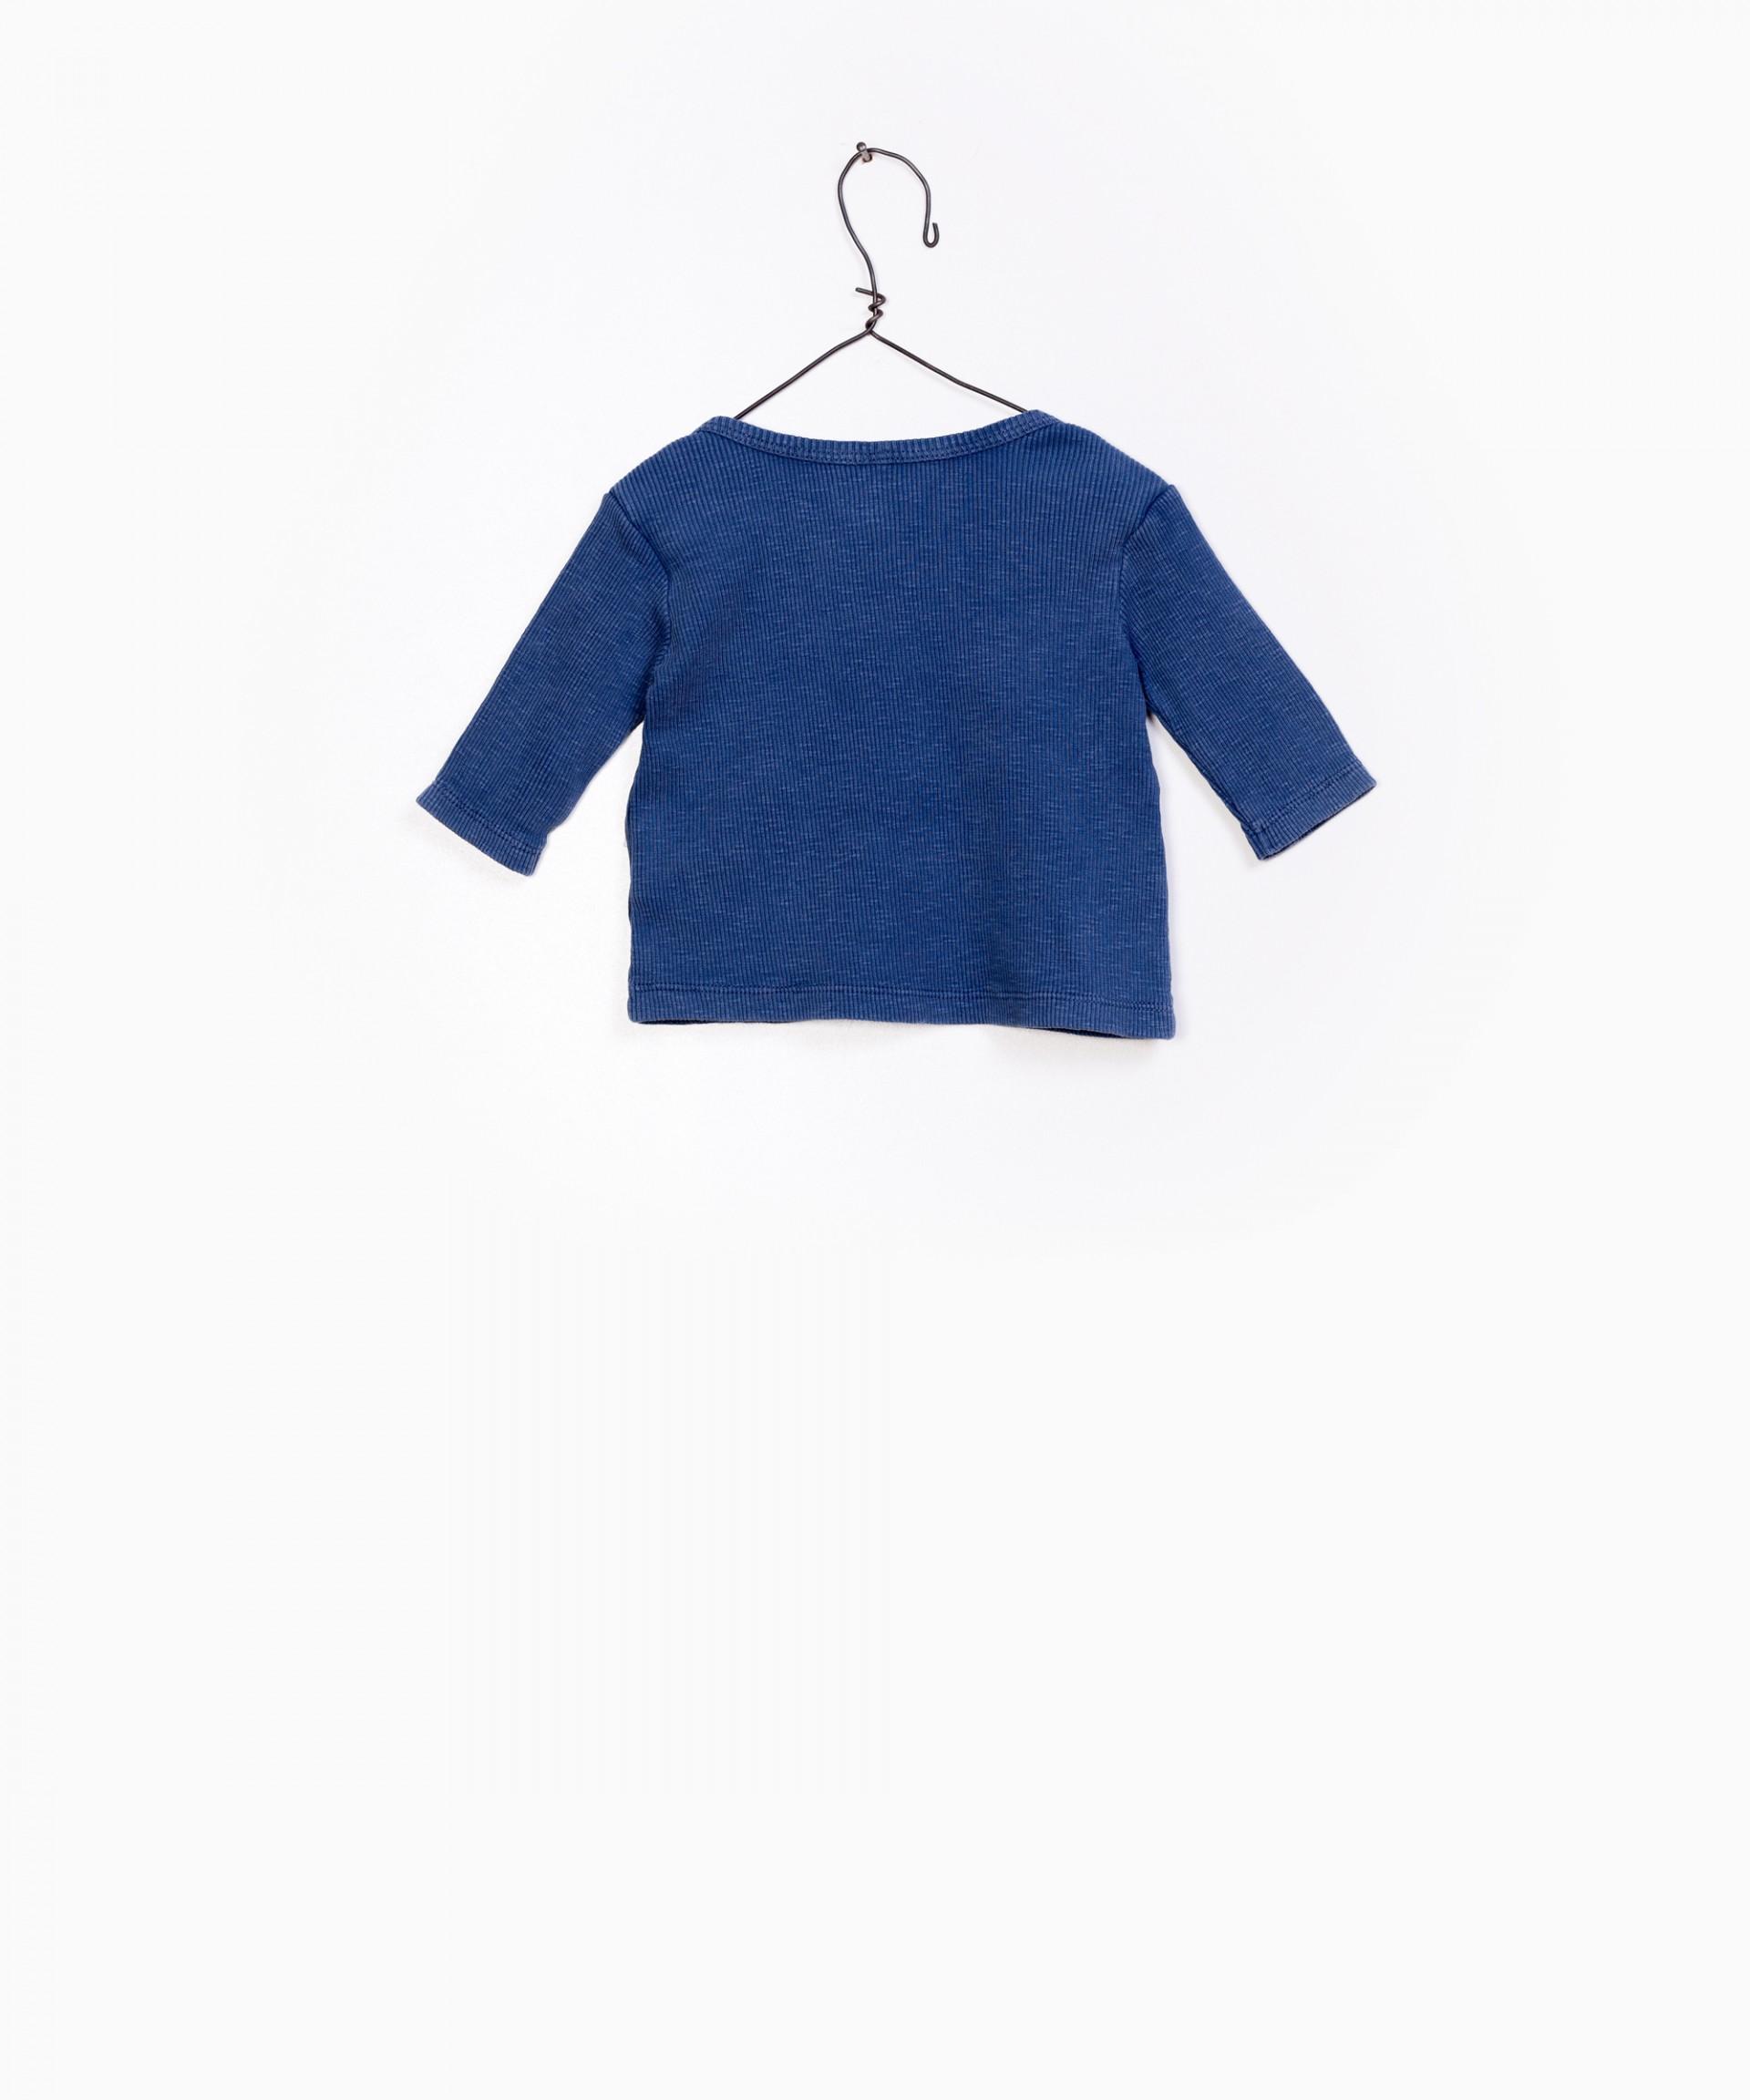 Camiseta RIB Flamé